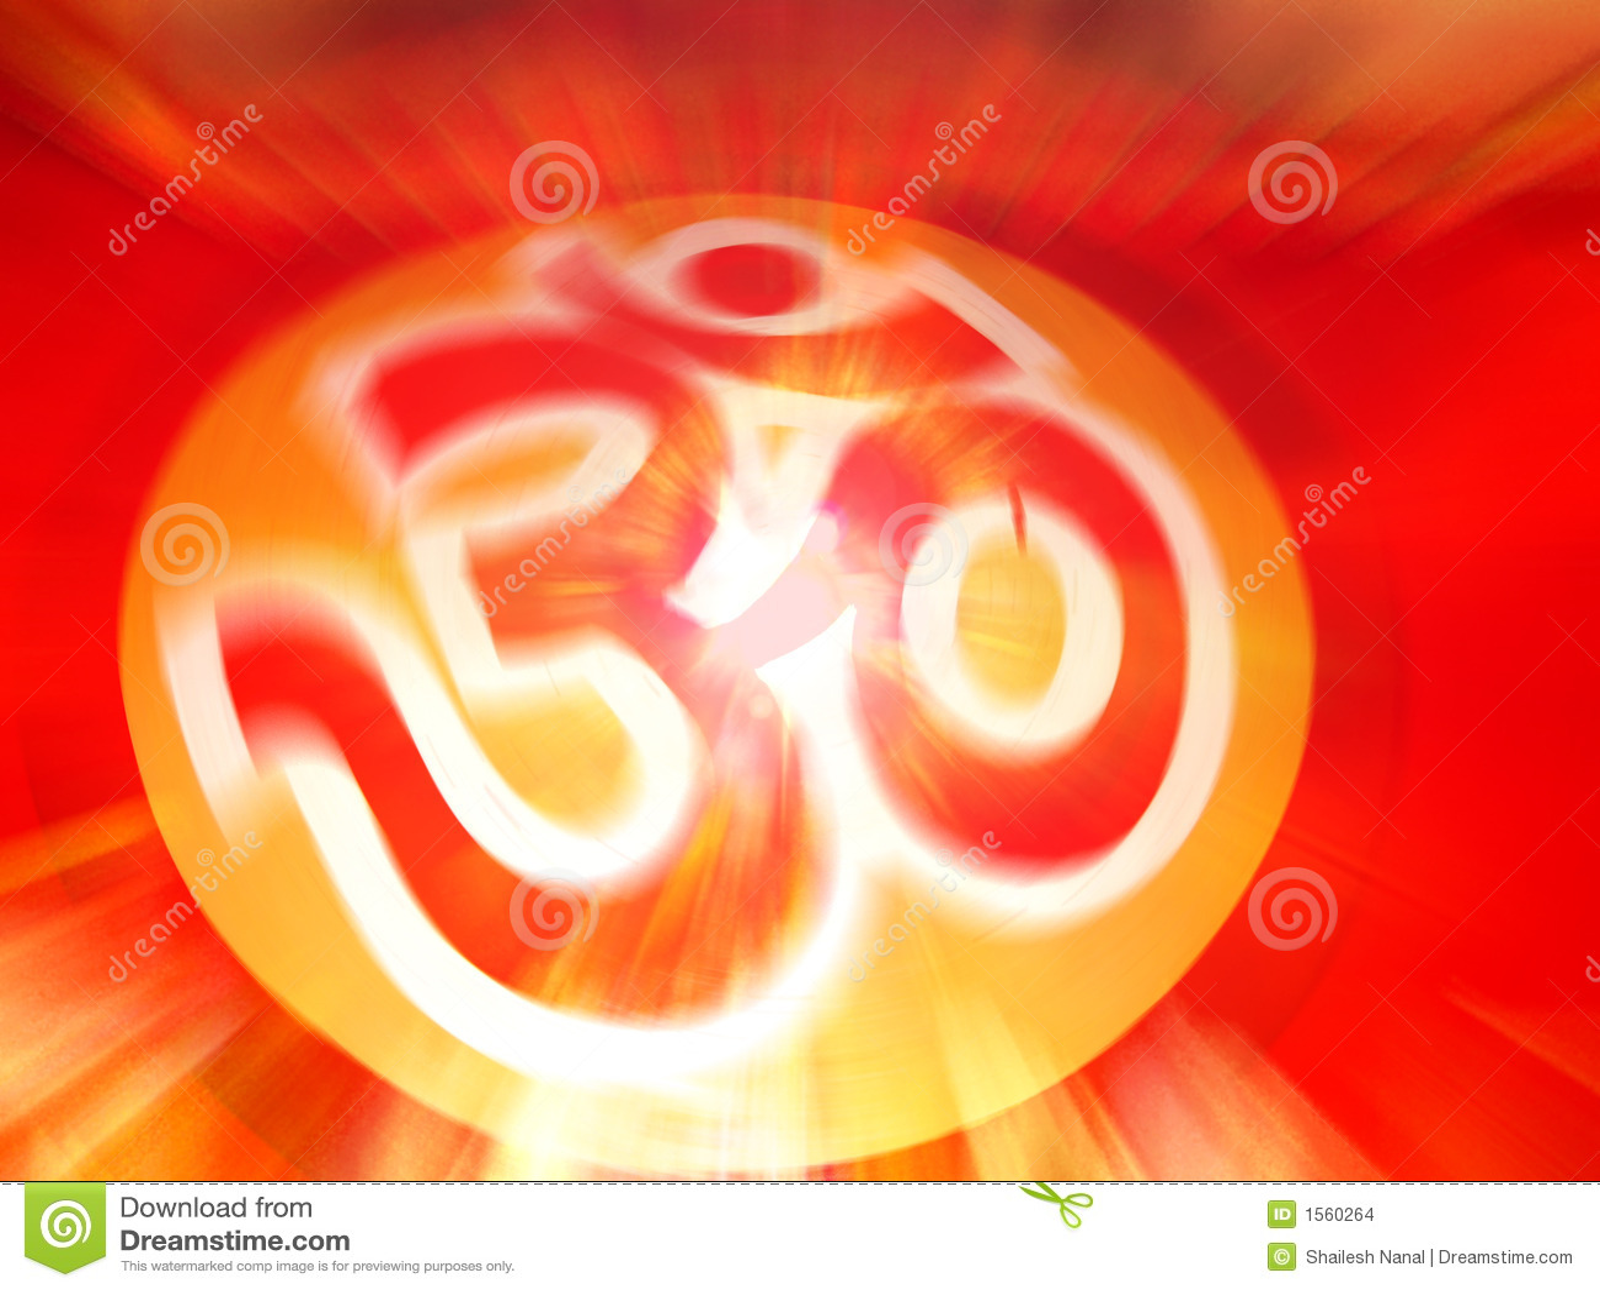 OM THE BEGINNING OF SPIRITUAL EVOLUTION Stock Images